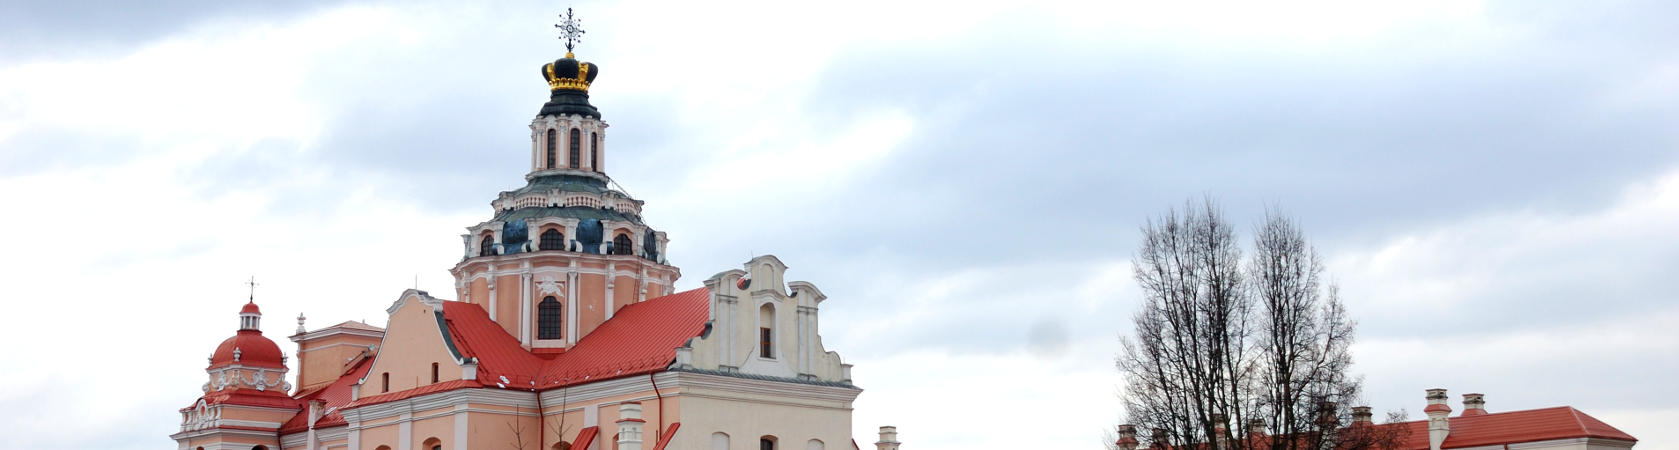 Sv. Kazimiero baznycia